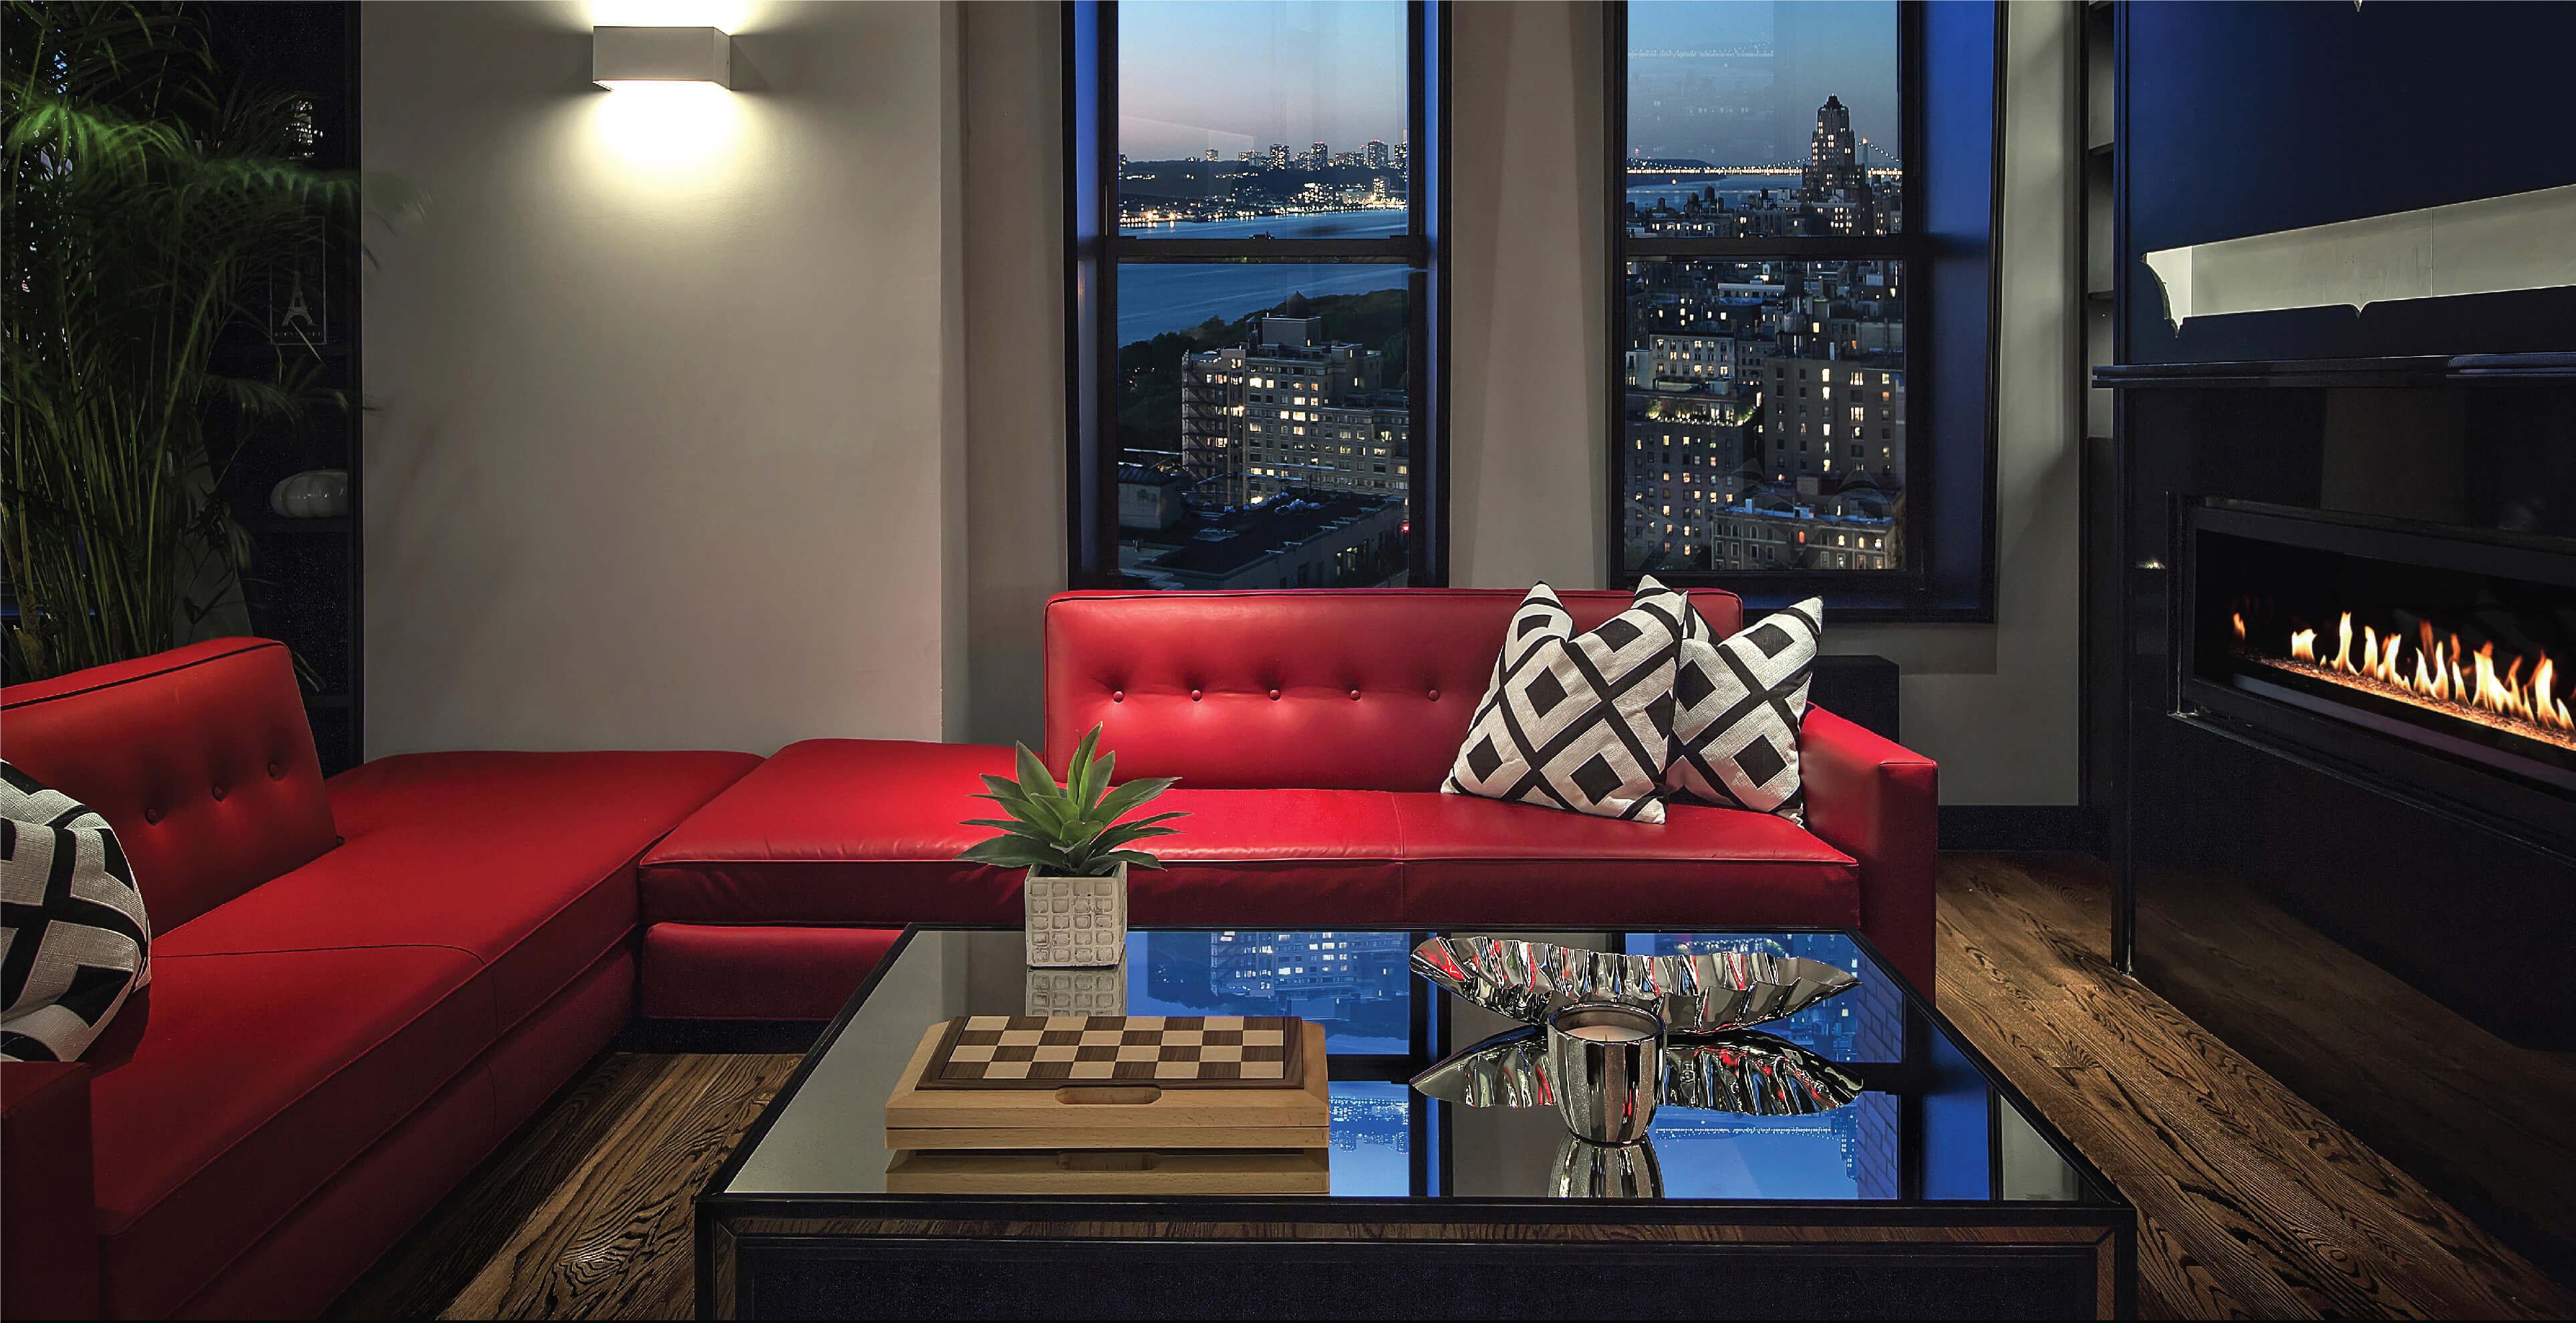 windermere building lounge image